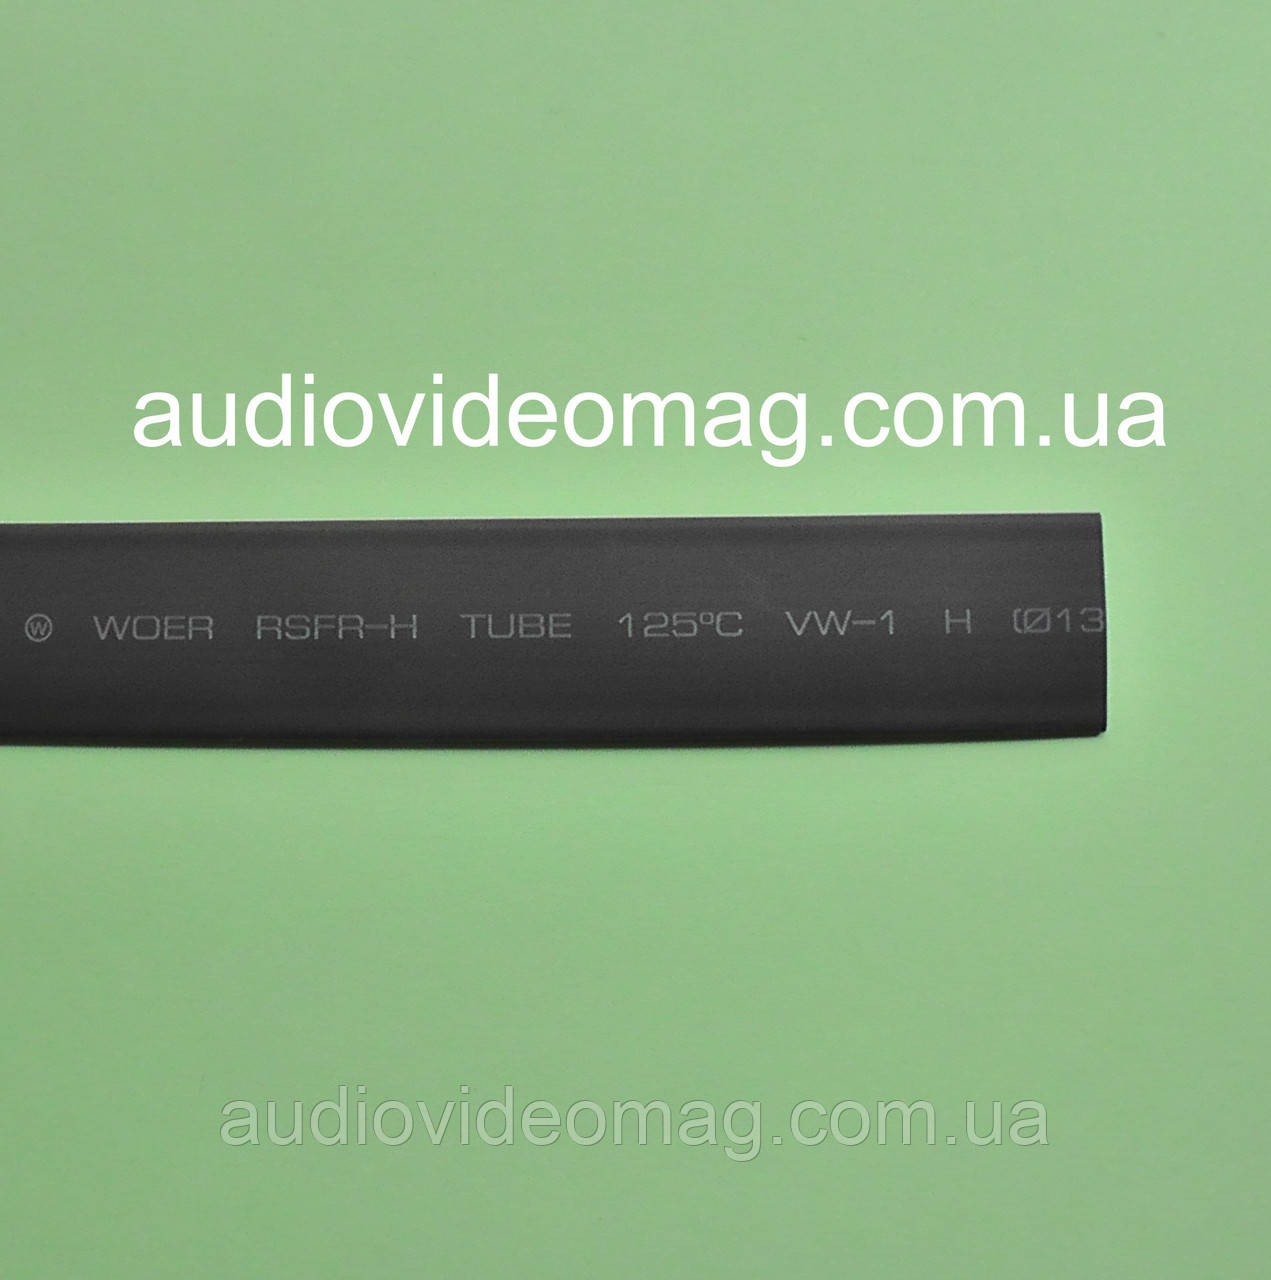 Термоусадочная трубка (2:1) - 13.0/6.5 мм, 1 метр, черная